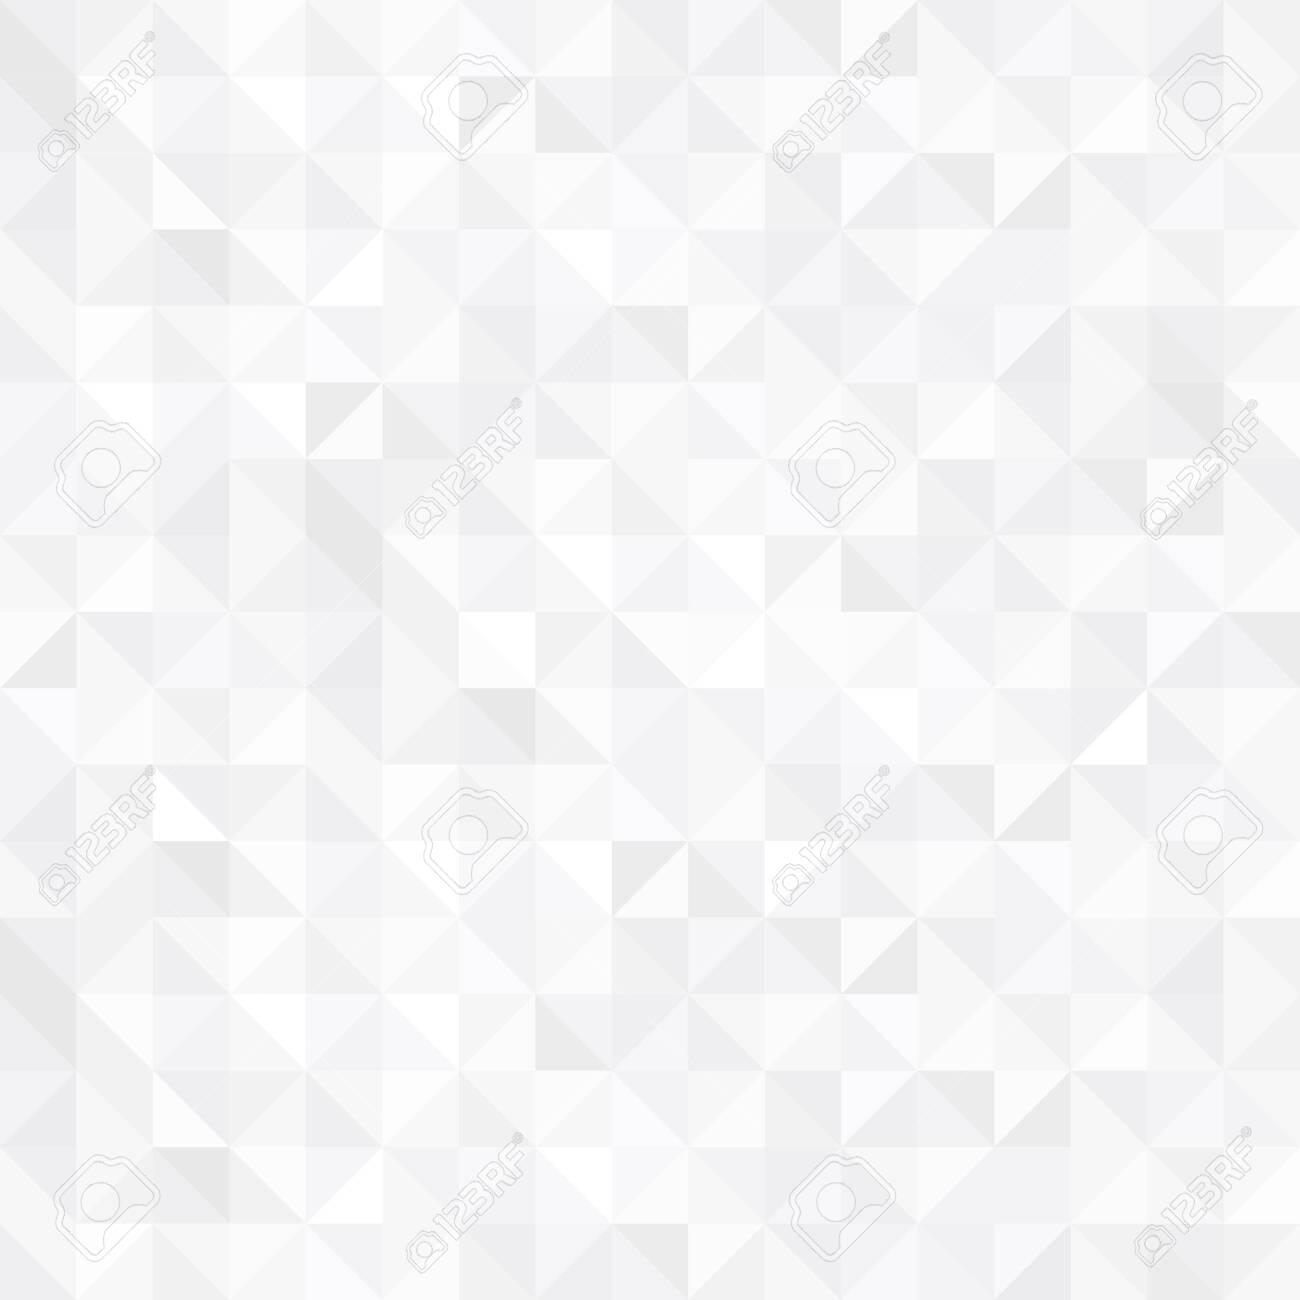 Seamless geometric pattern. Abstract triangular background. - 137166630